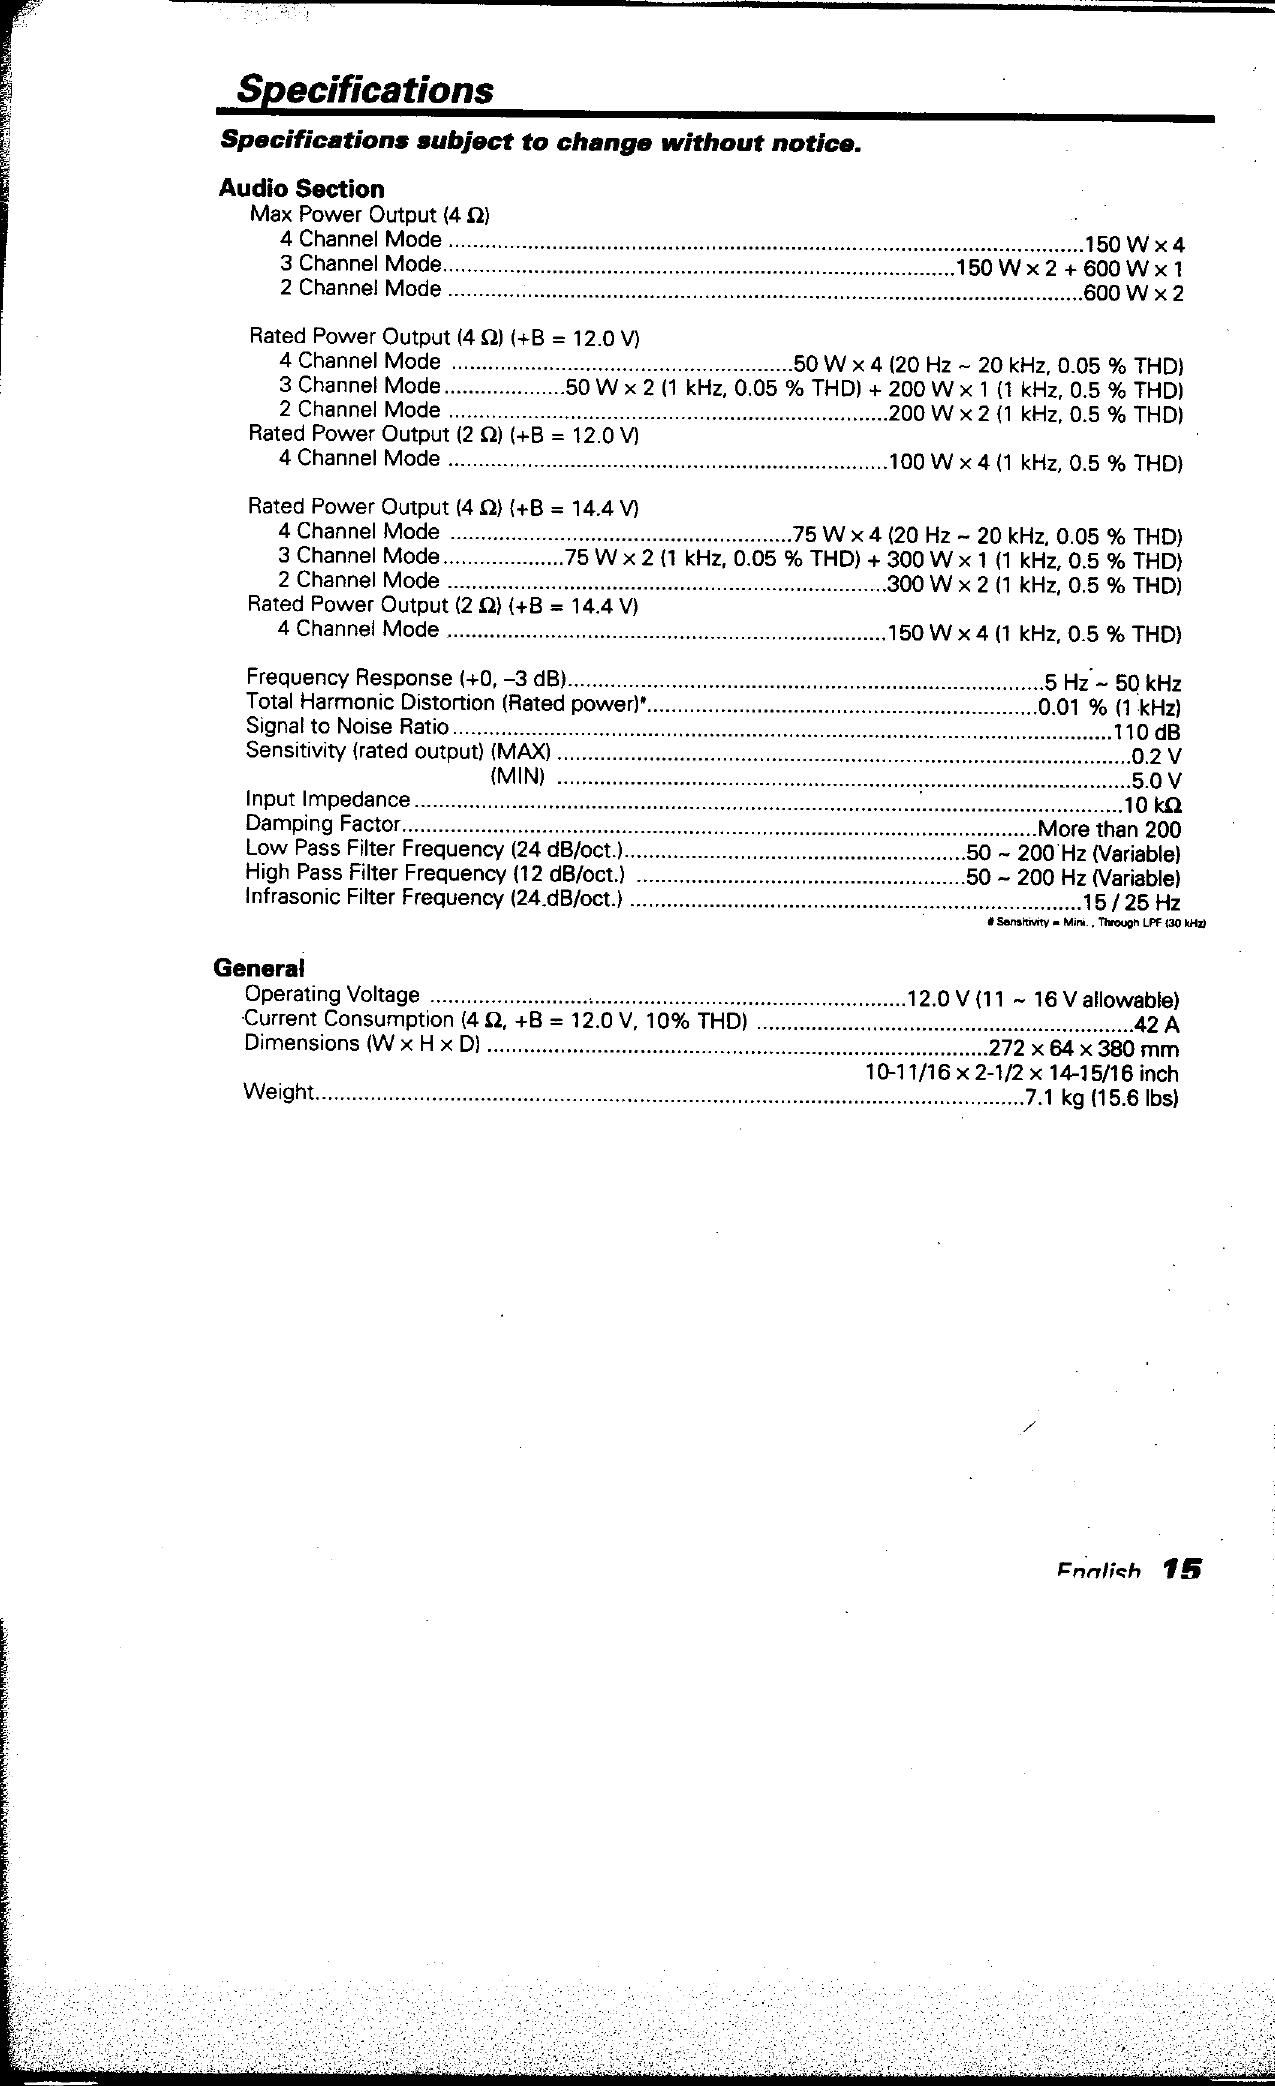 Kenwood Excelon Kac X501F Users Manual on